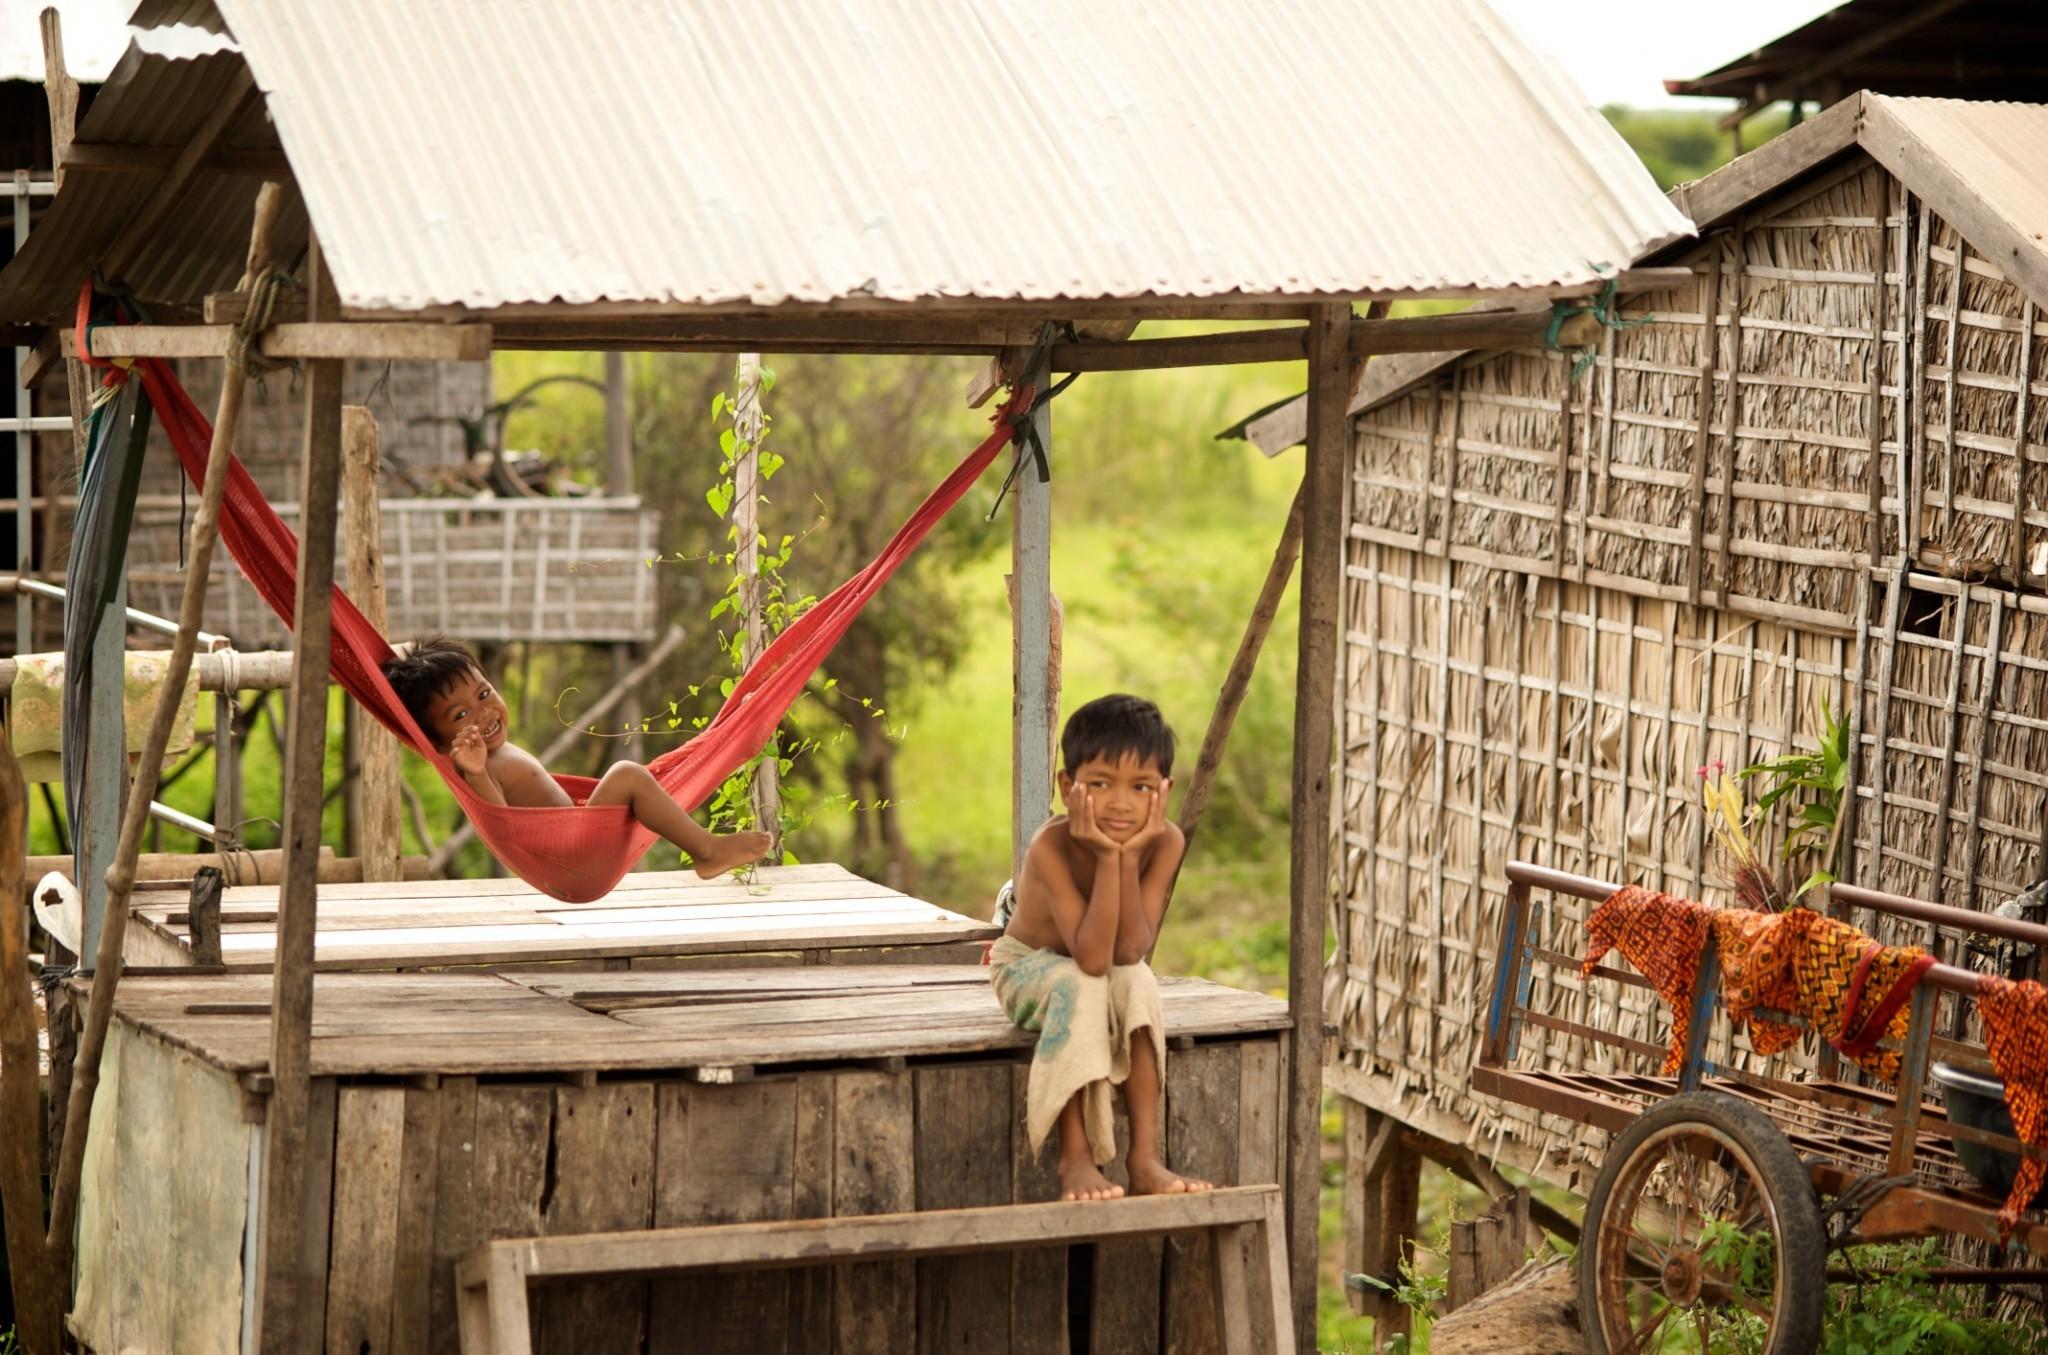 AlexSoh_July09 Cambodia071